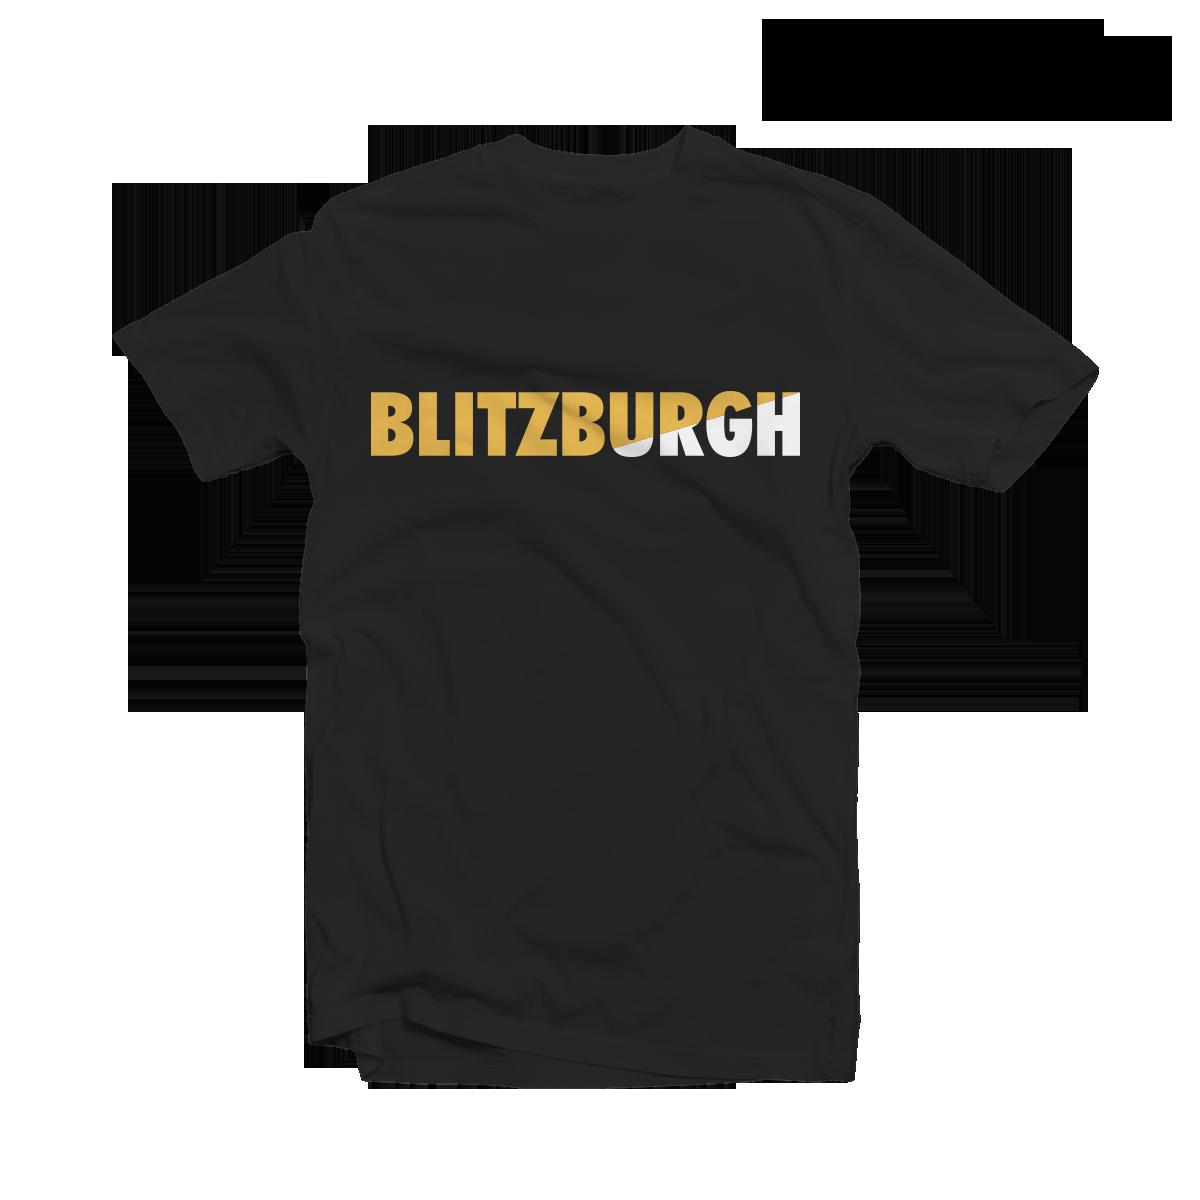 35711b5d781 Blitzburgh Black Tee - Pittsburgh Steelers T Shirt by Die Hard League